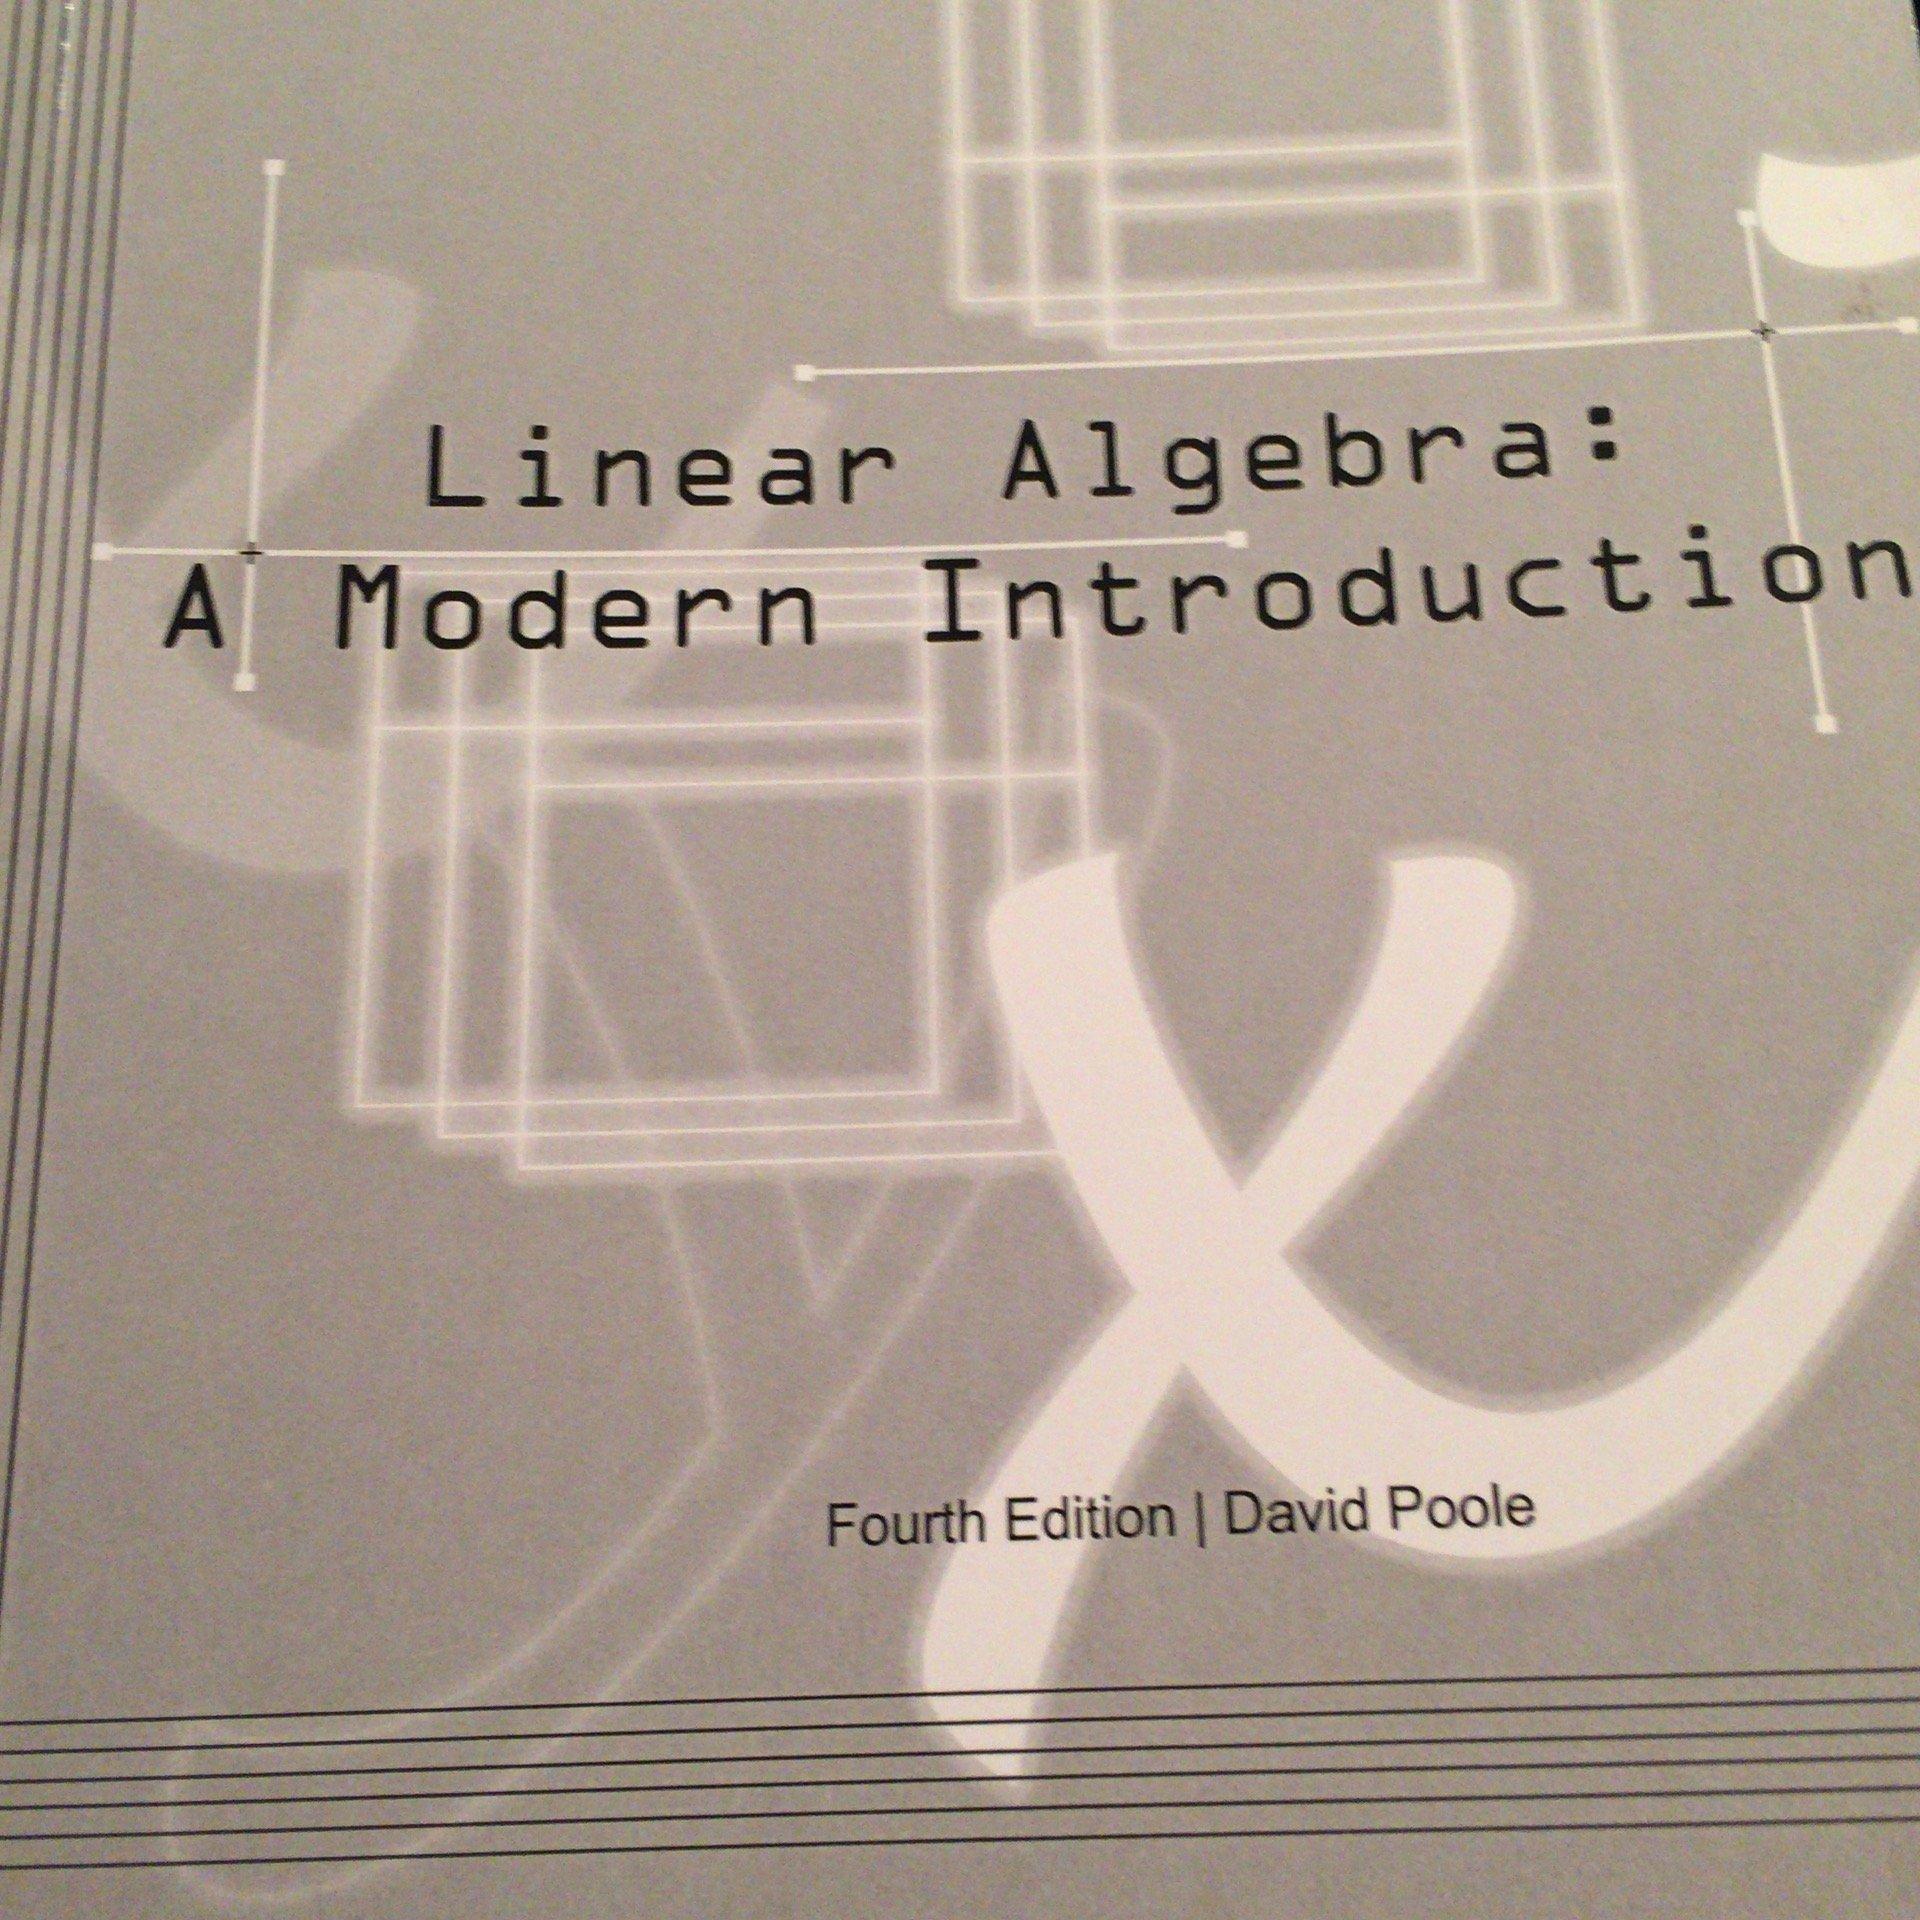 Linear Algebra A Modern Introduction David Poole Fourth Edition 2015: David  Poole: 9781305016958: Amazon.com: Books